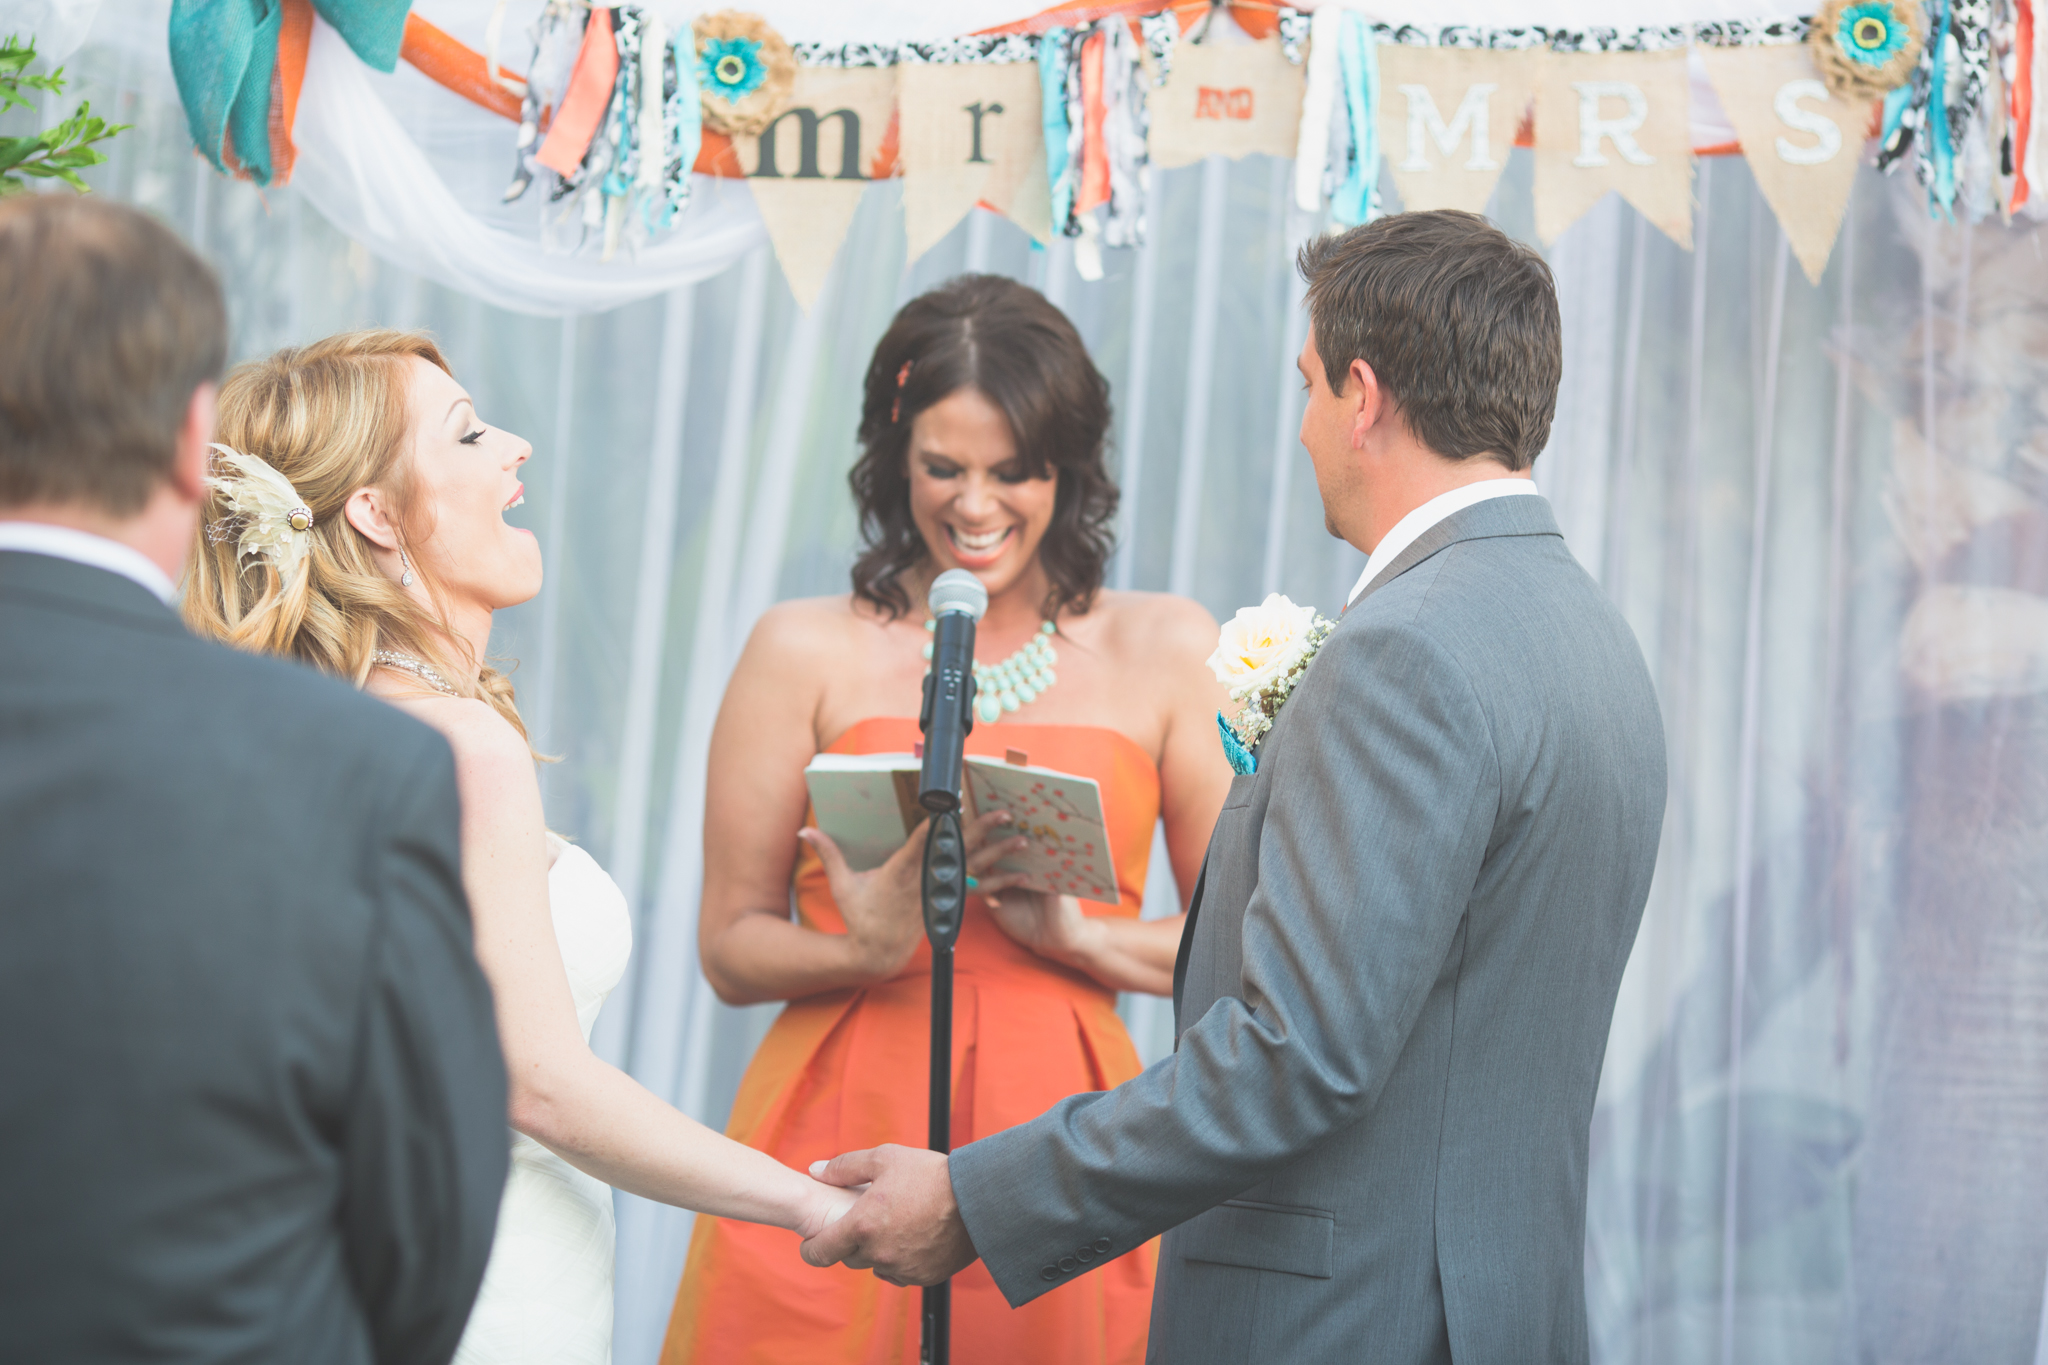 scottsdale-wedding-photographer-bride-laughing-ceremony-el-dorado